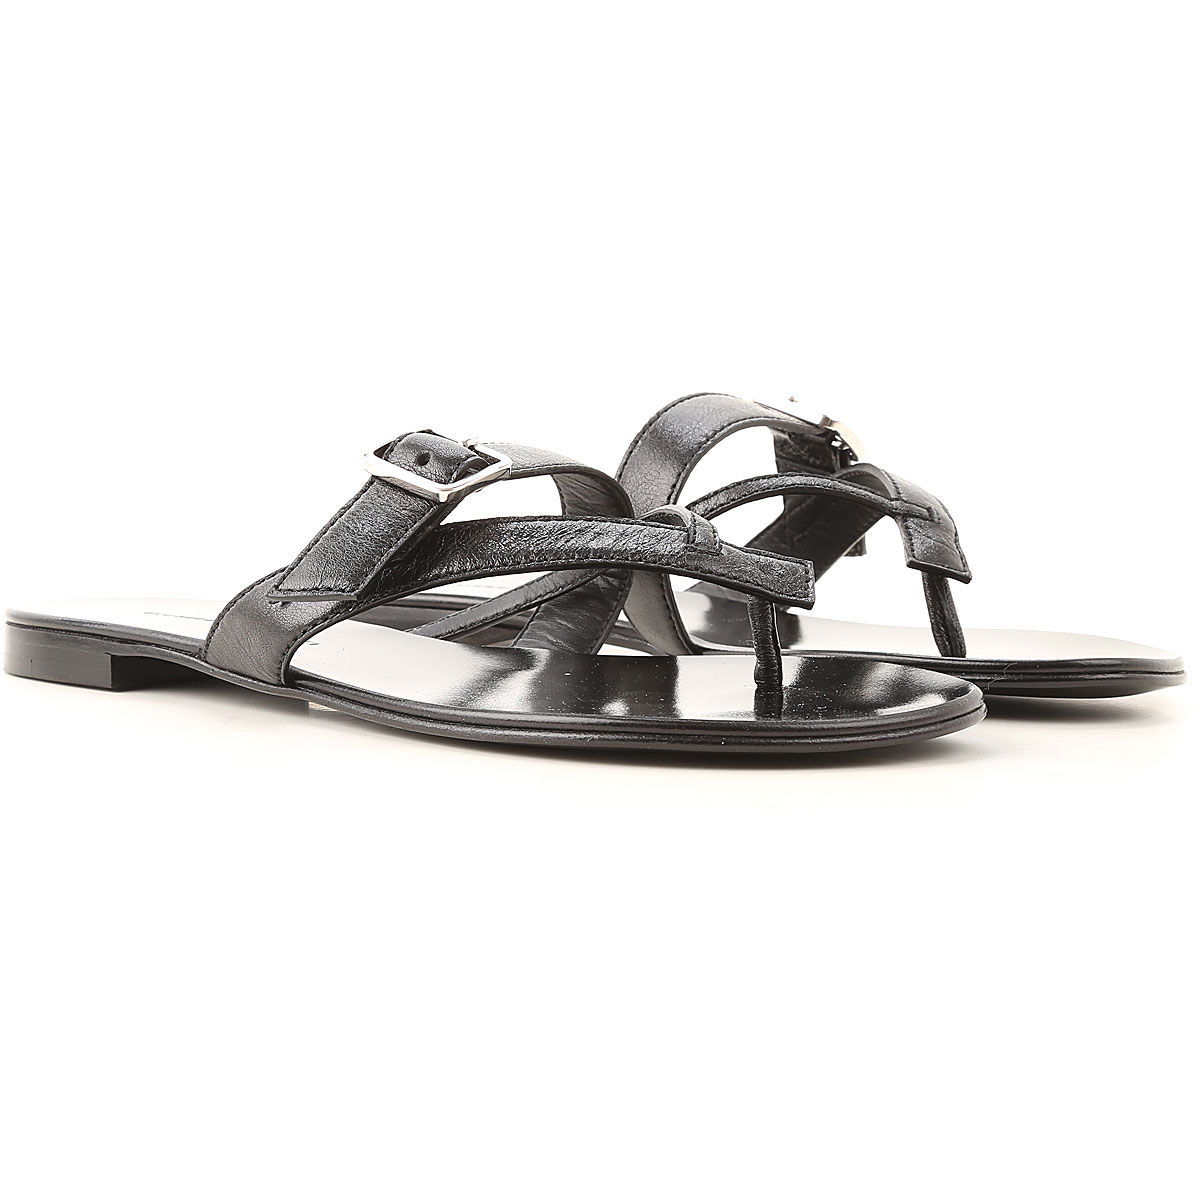 Giuseppe Zanotti Design Sandals for Women On Sale, Black, Leather, 2019, 10 6 8 9